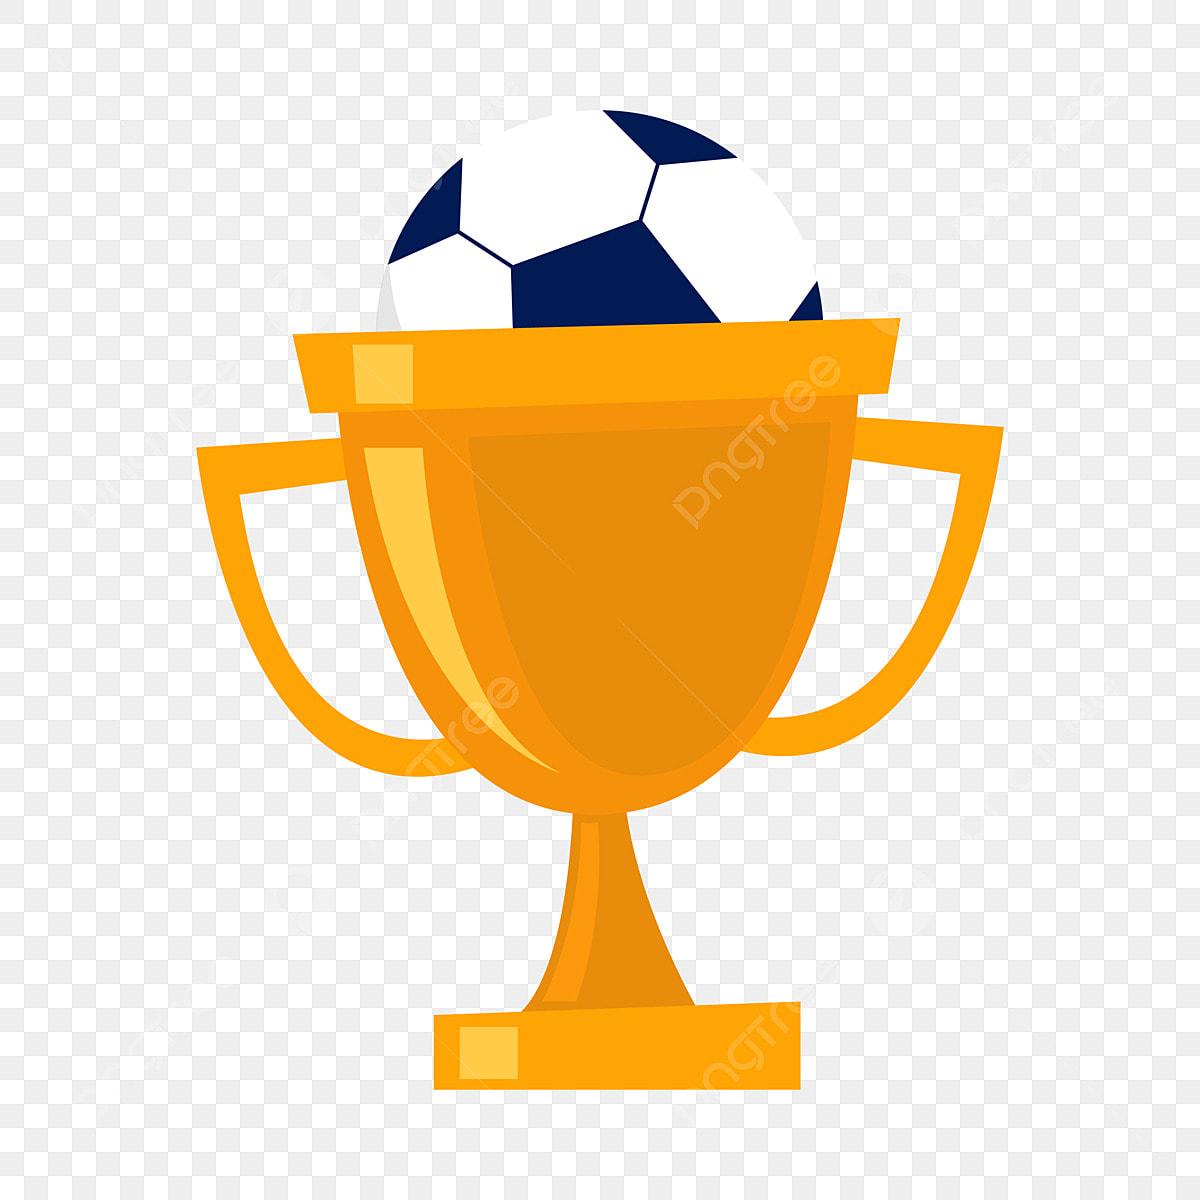 Bola Sepak Bola Sepak Trofi Piala Trofi Bola Sepak Piala